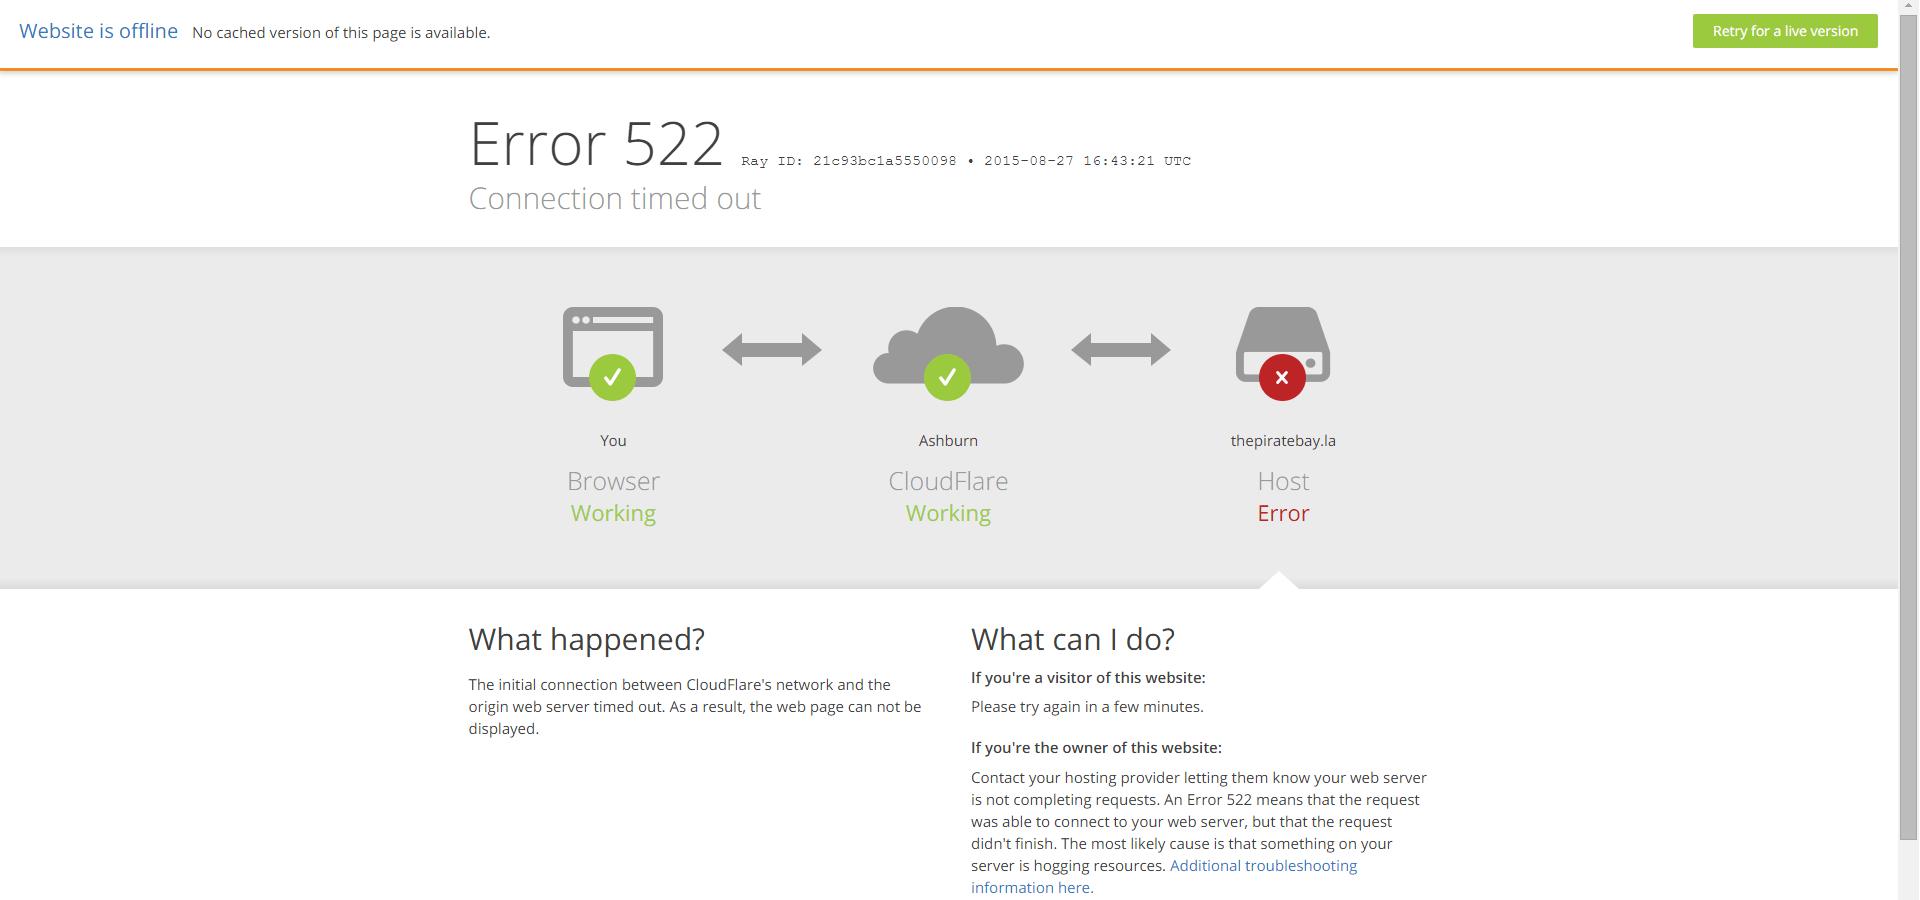 tpb_down_error_522